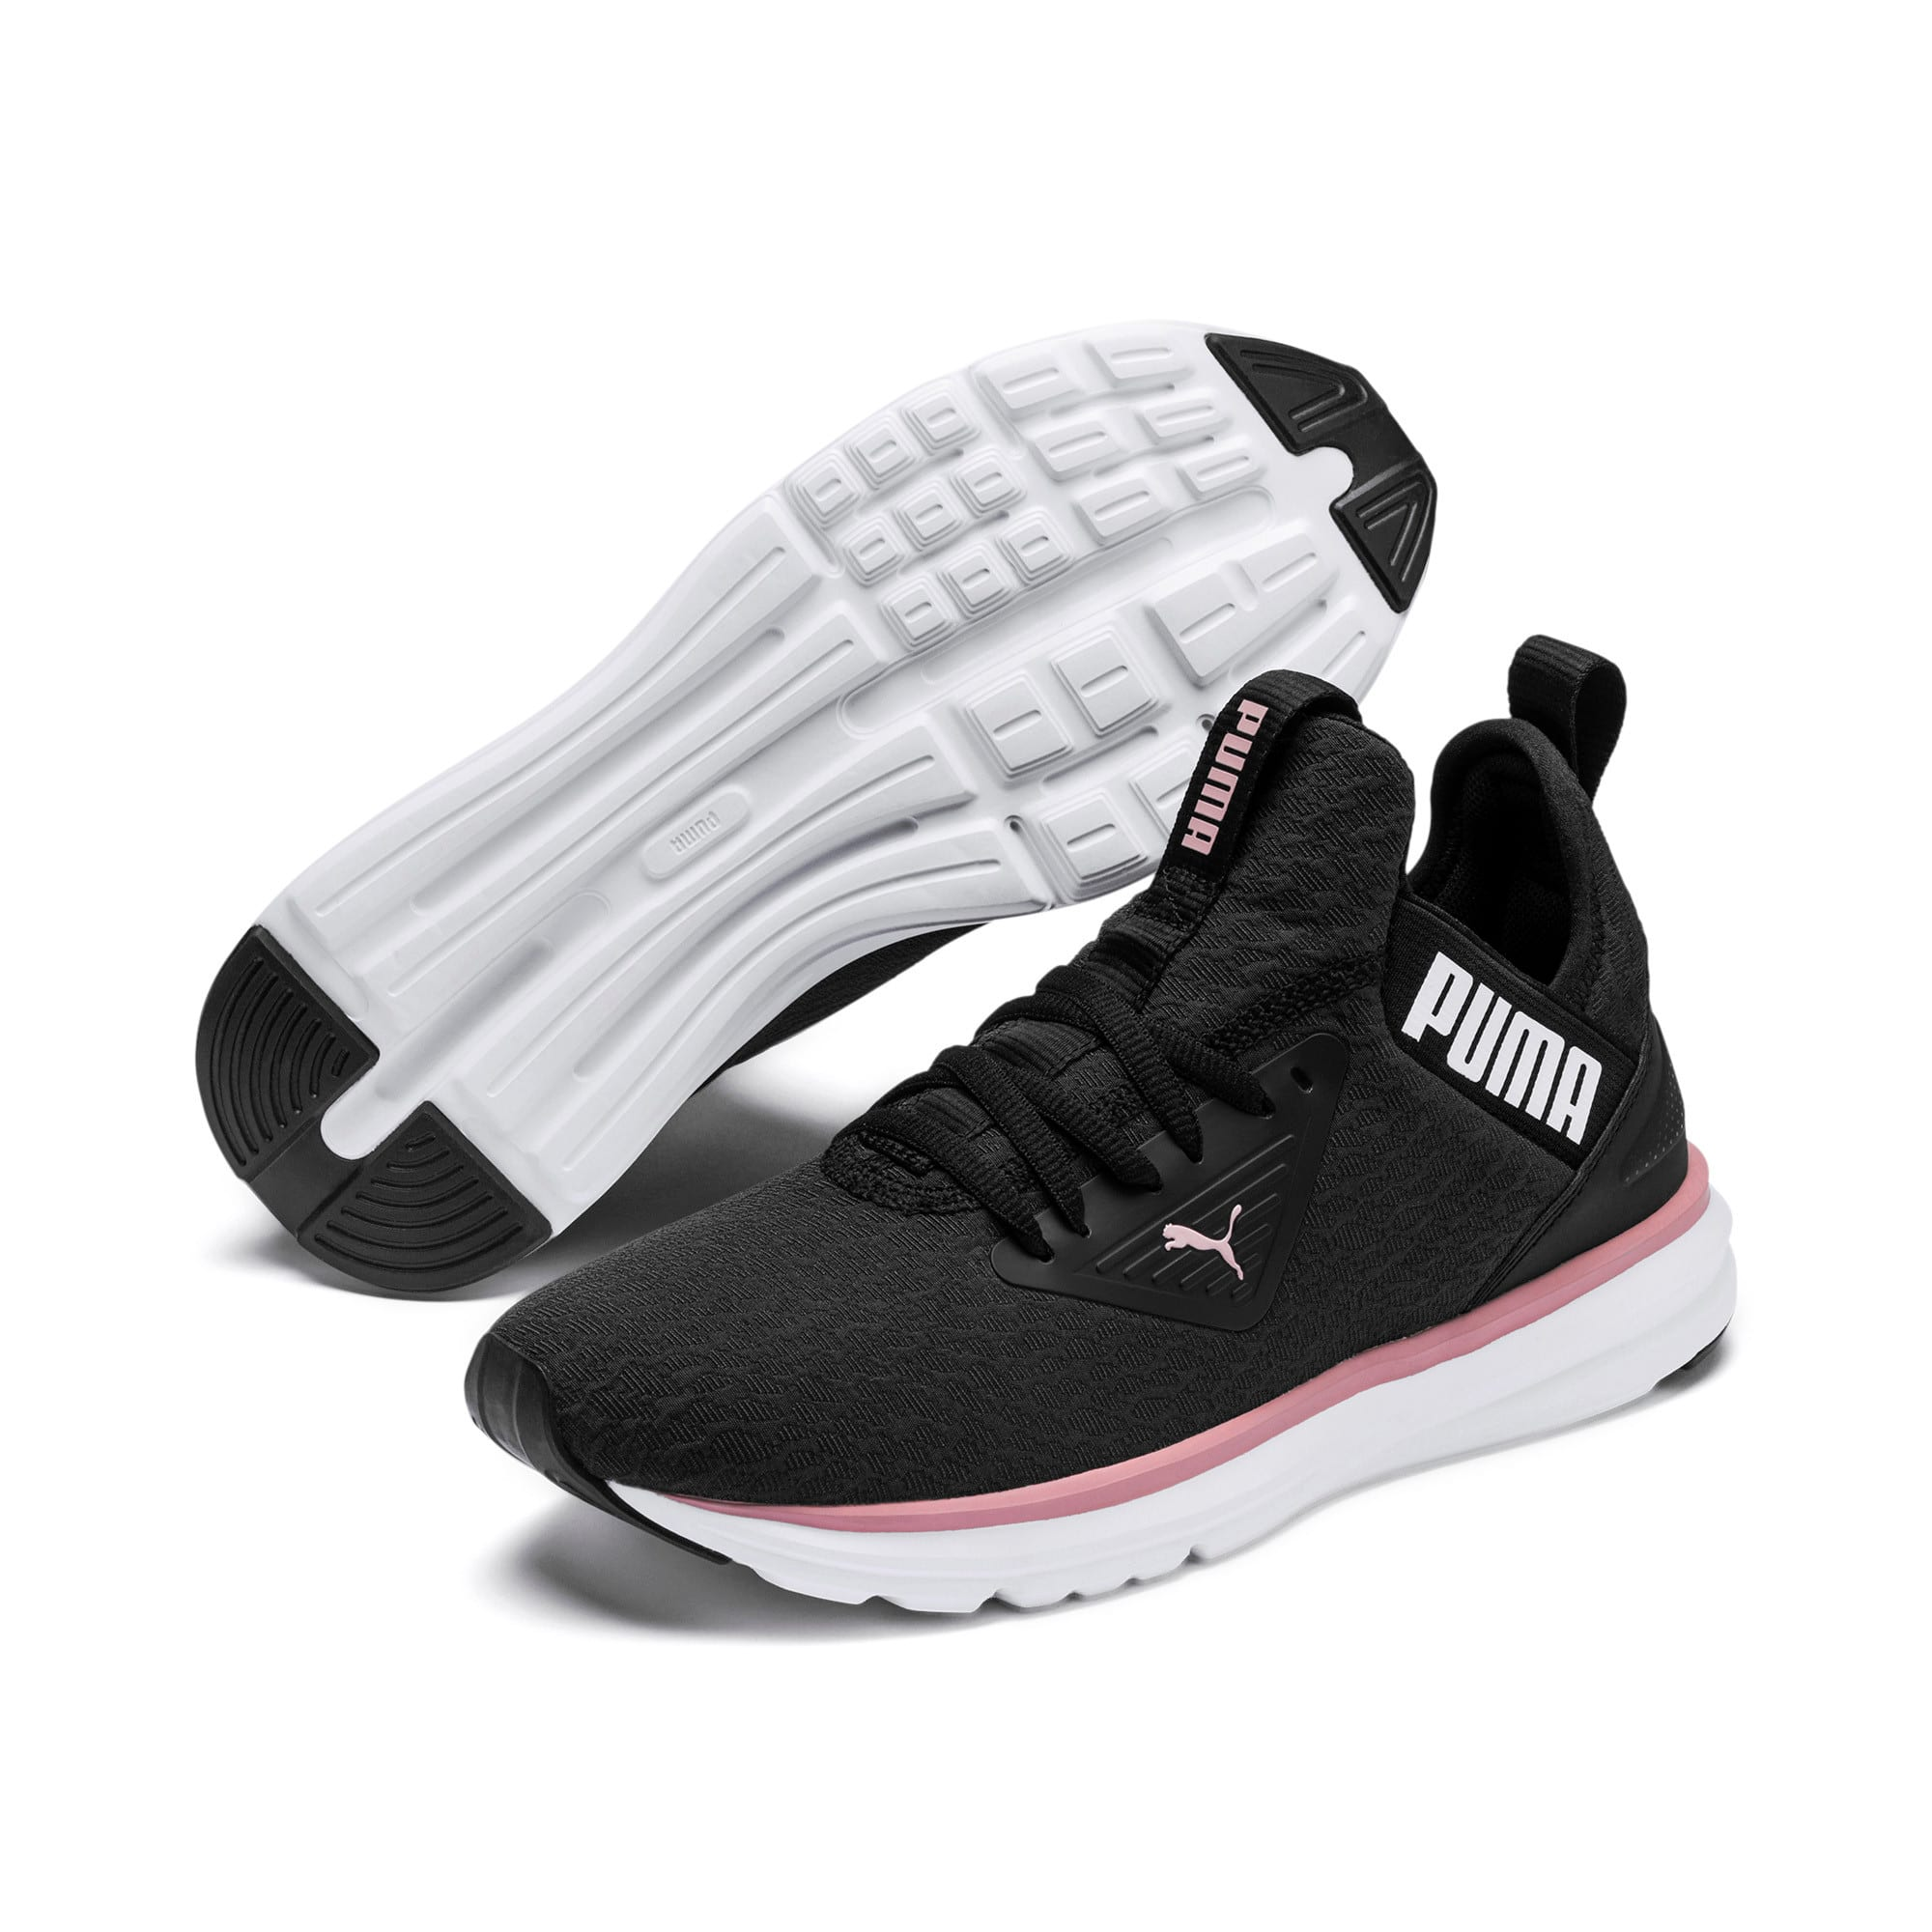 Thumbnail 3 of Enzo Beta Fluid Women's Training Shoes, Puma Black-Bridal Rose, medium